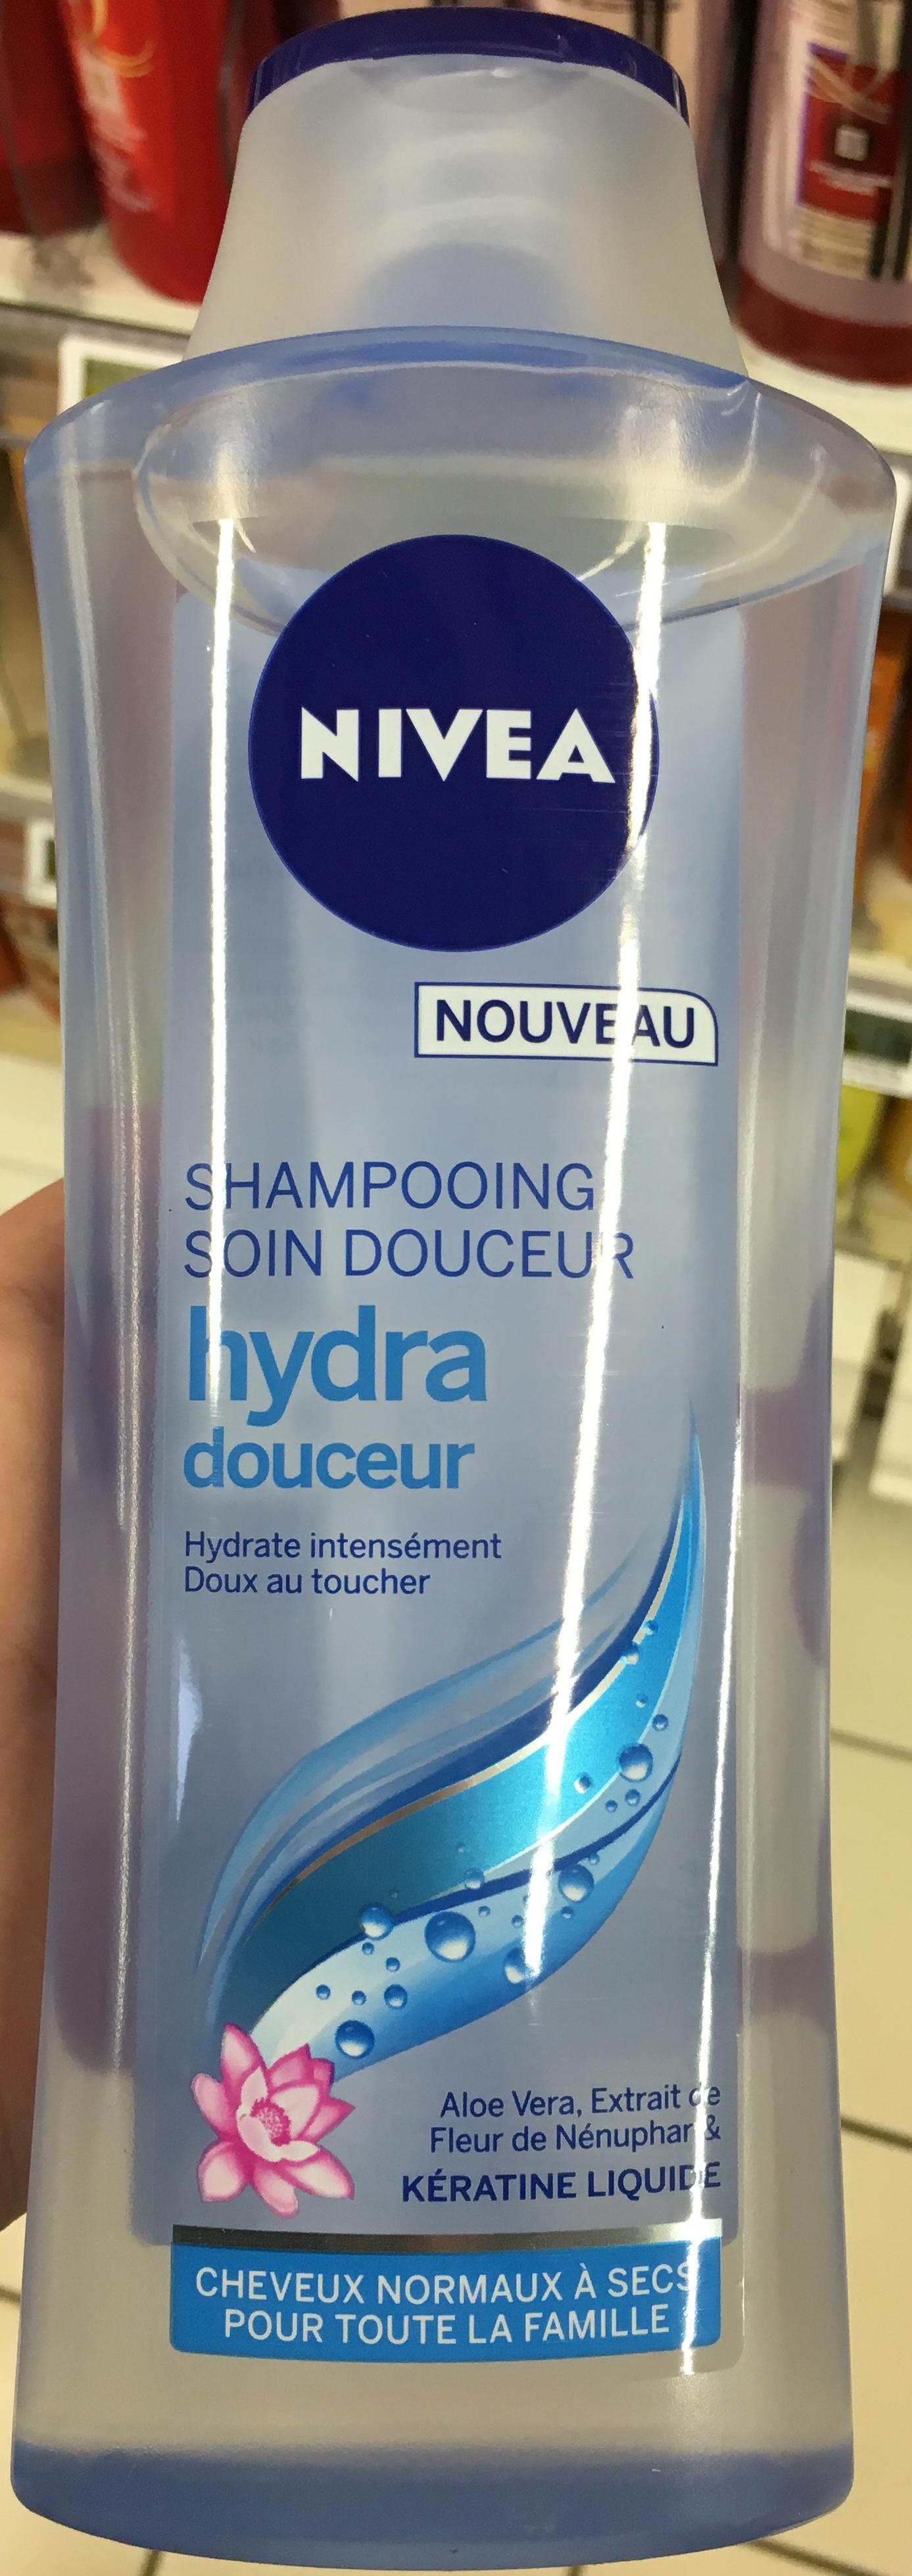 Shampooing soin douceur hydra douceur - Product - fr